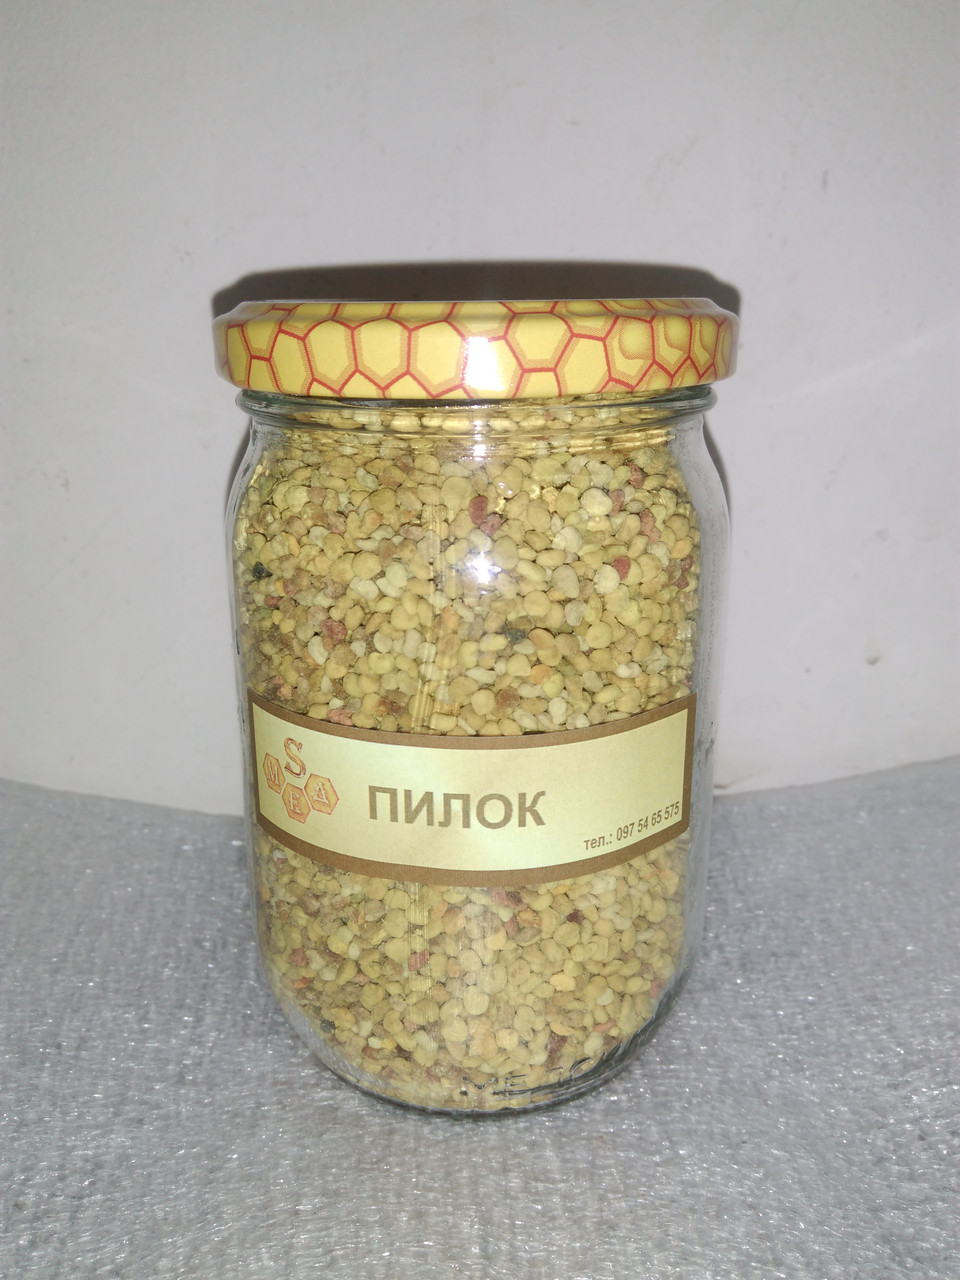 Пилок 0,27л ОРА АГРО-ЕКО, фото 1